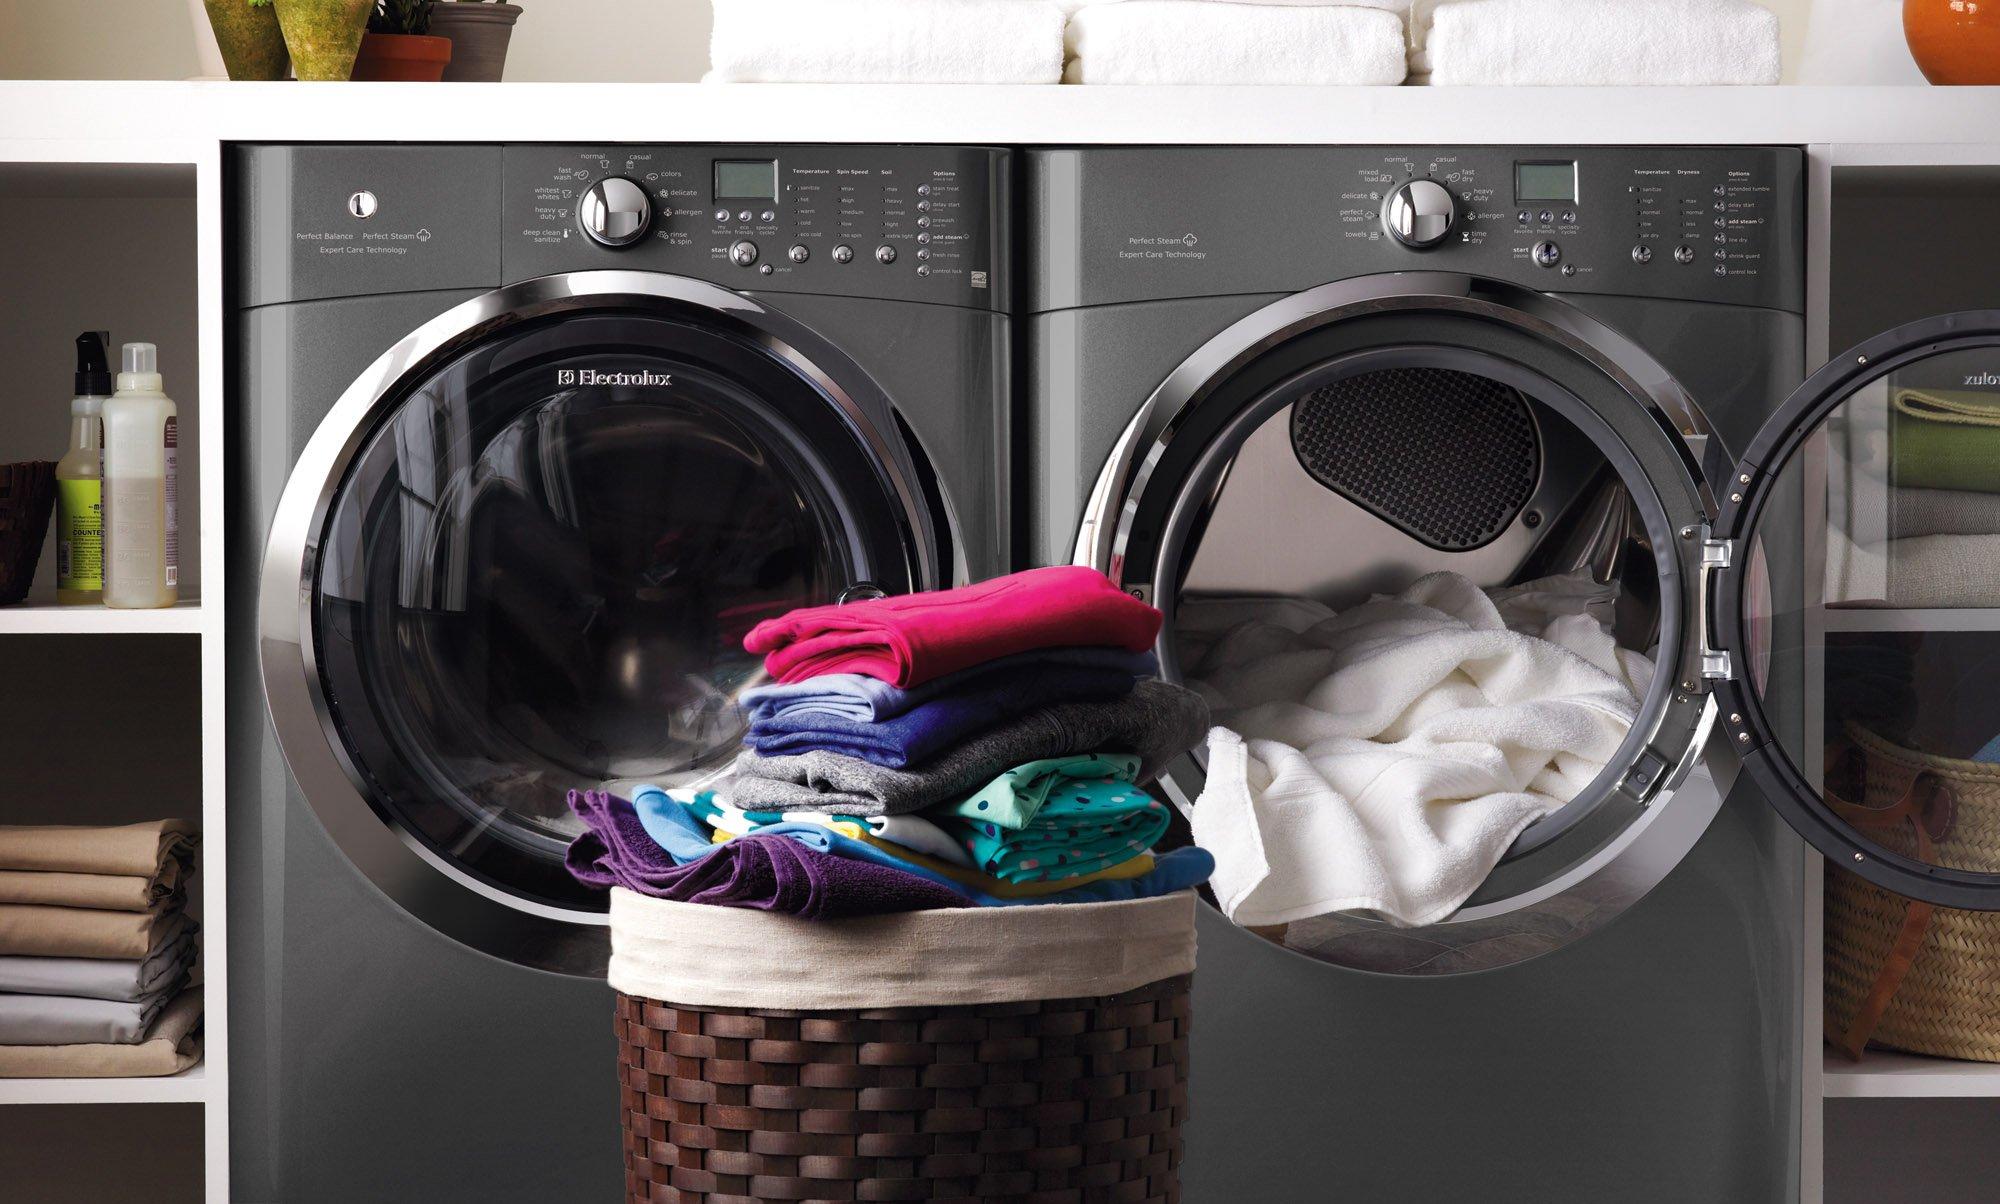 Electrolux Laundry Bundle   Electrolux EIFLS60LT Washer & Electrolux EIMGD60LT Gas Dryer - Titanium